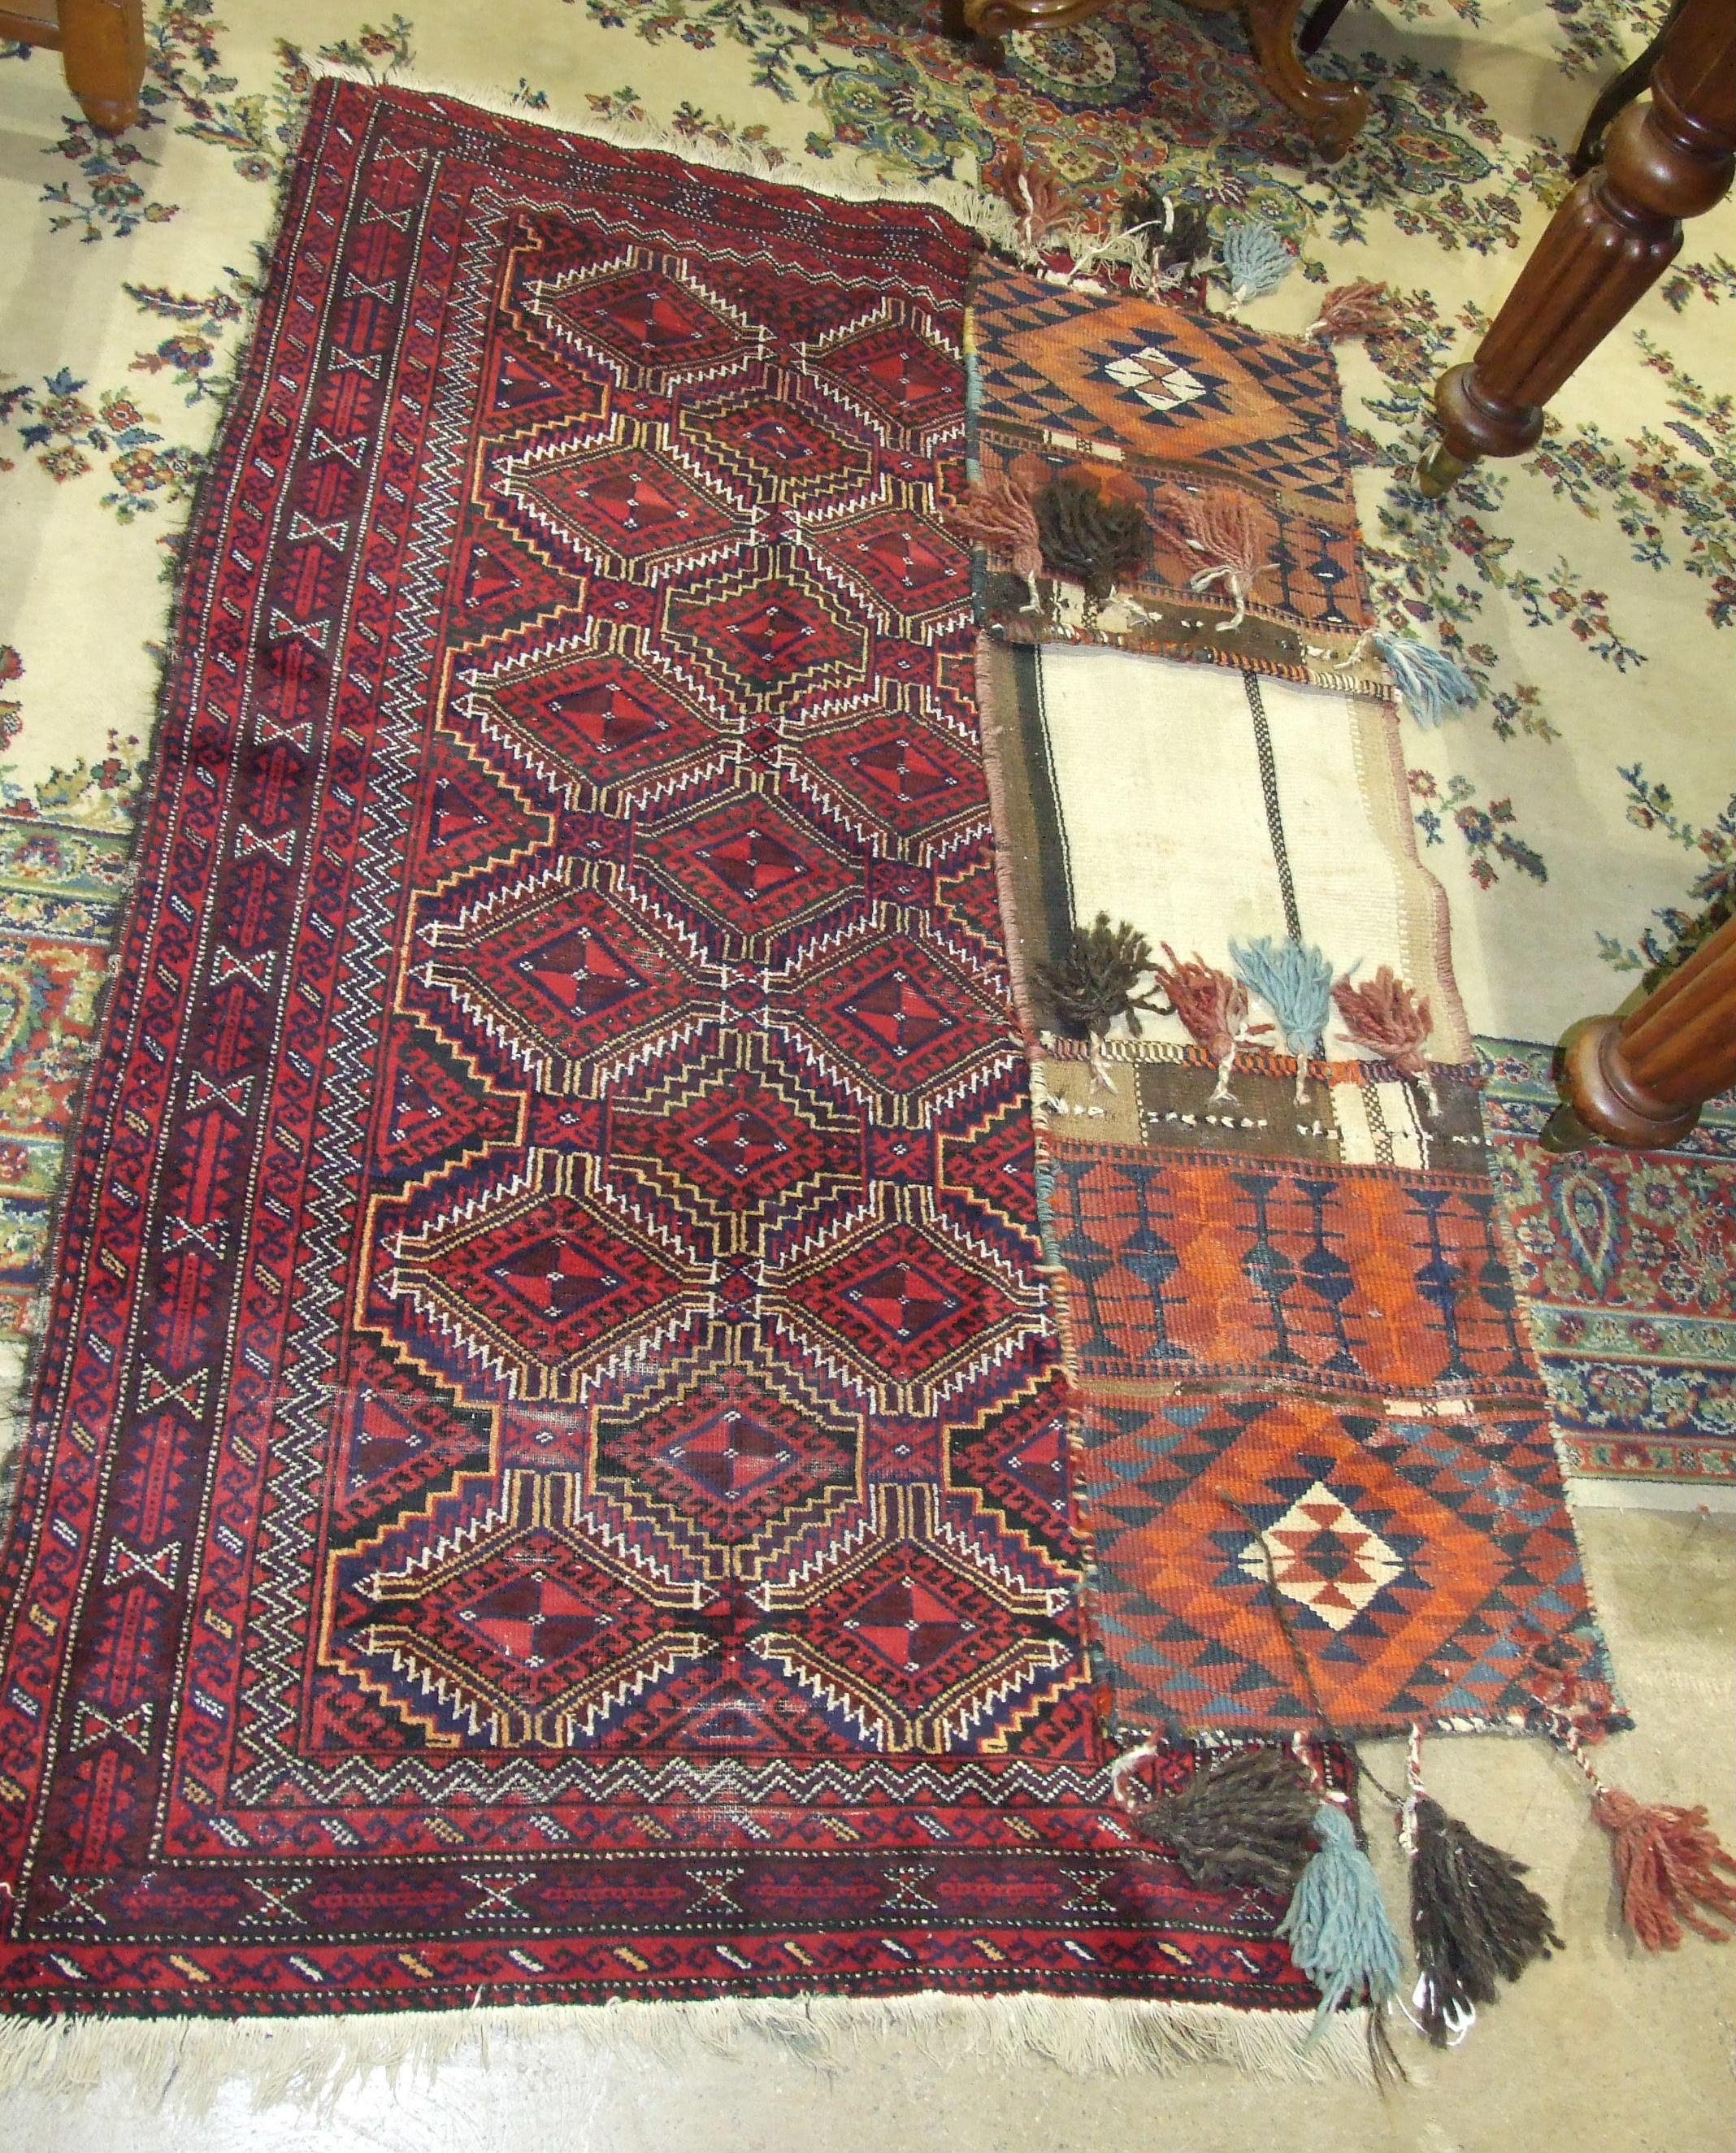 Lot 23 - An Eastern rug, 181 x 98cm and a saddle bag rug, (2).